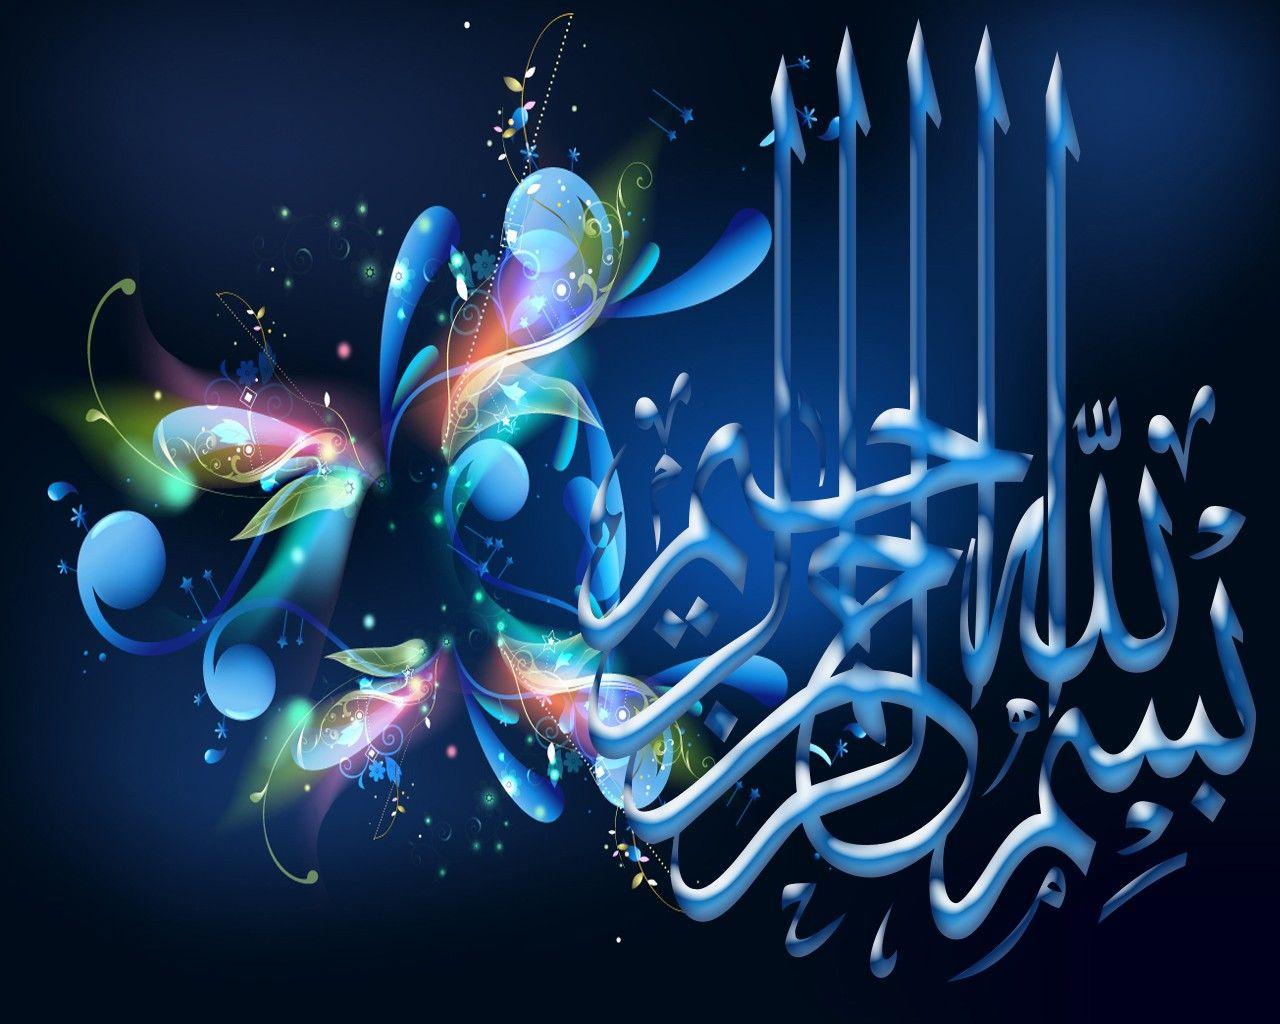 islamic,urdu hadees,urdu artical, bismillah wallpaper